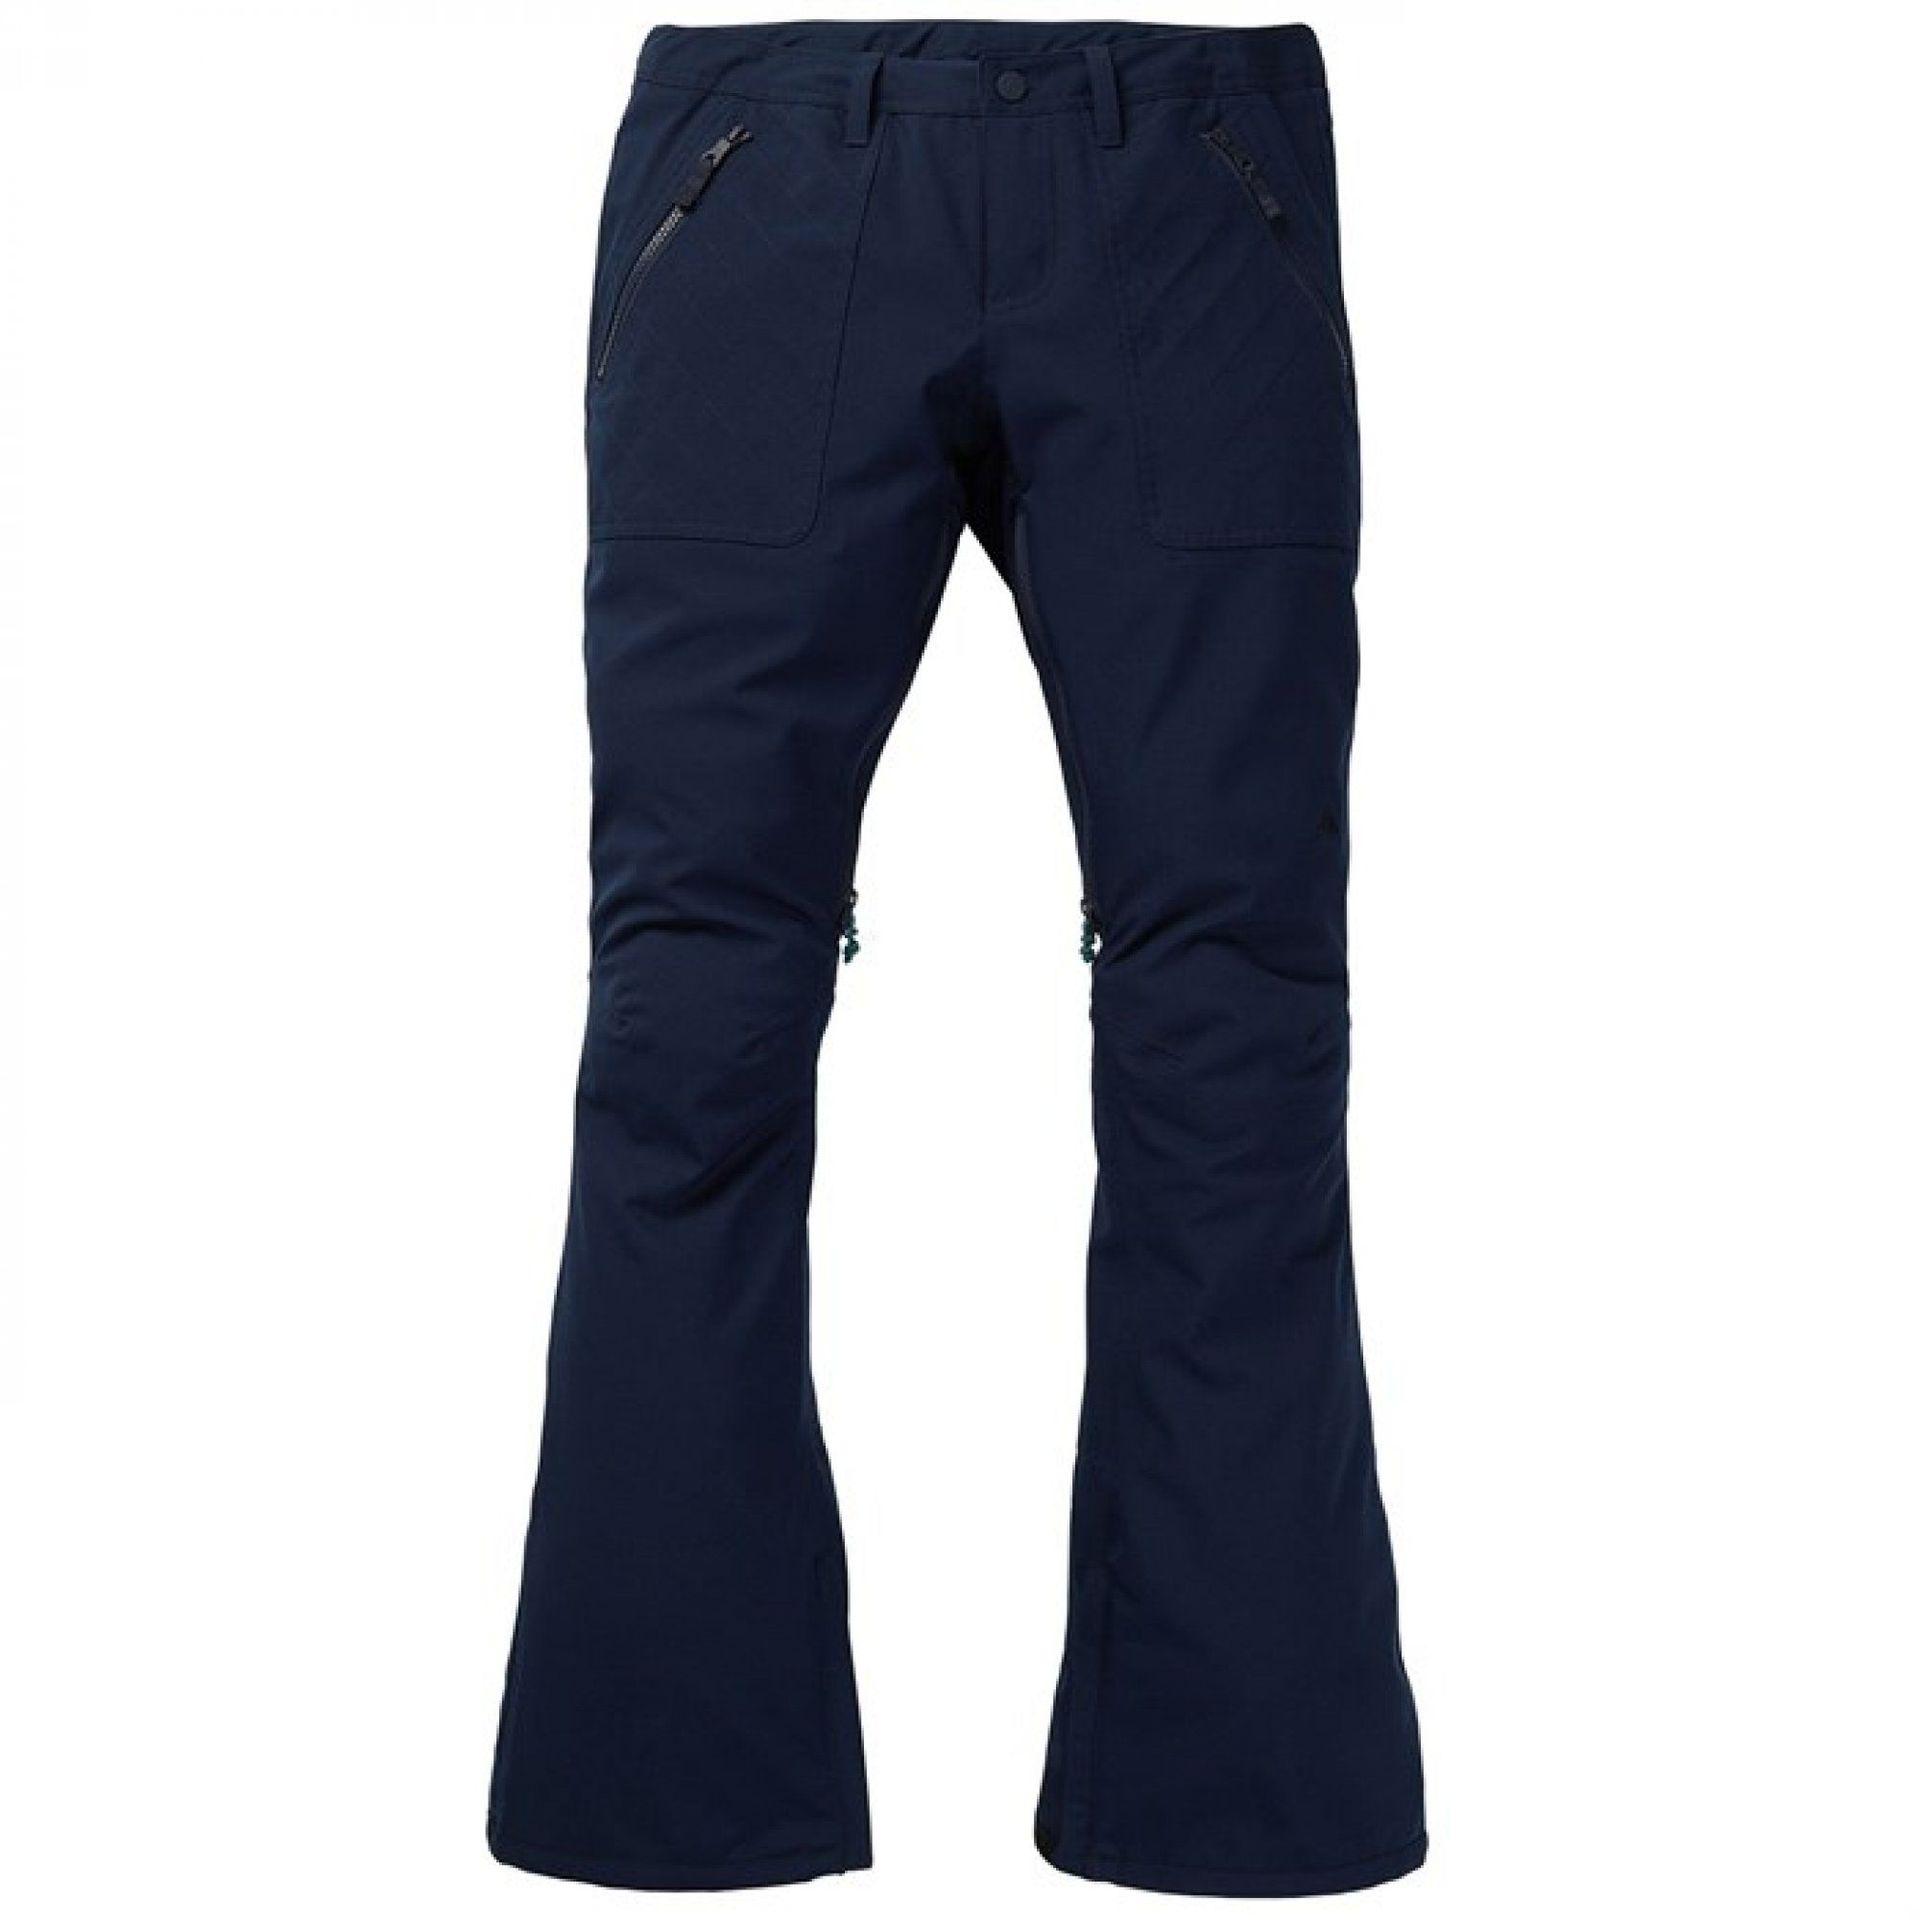 SPODNIE BURTON VIDA DRESS BLUE 150061 400 6